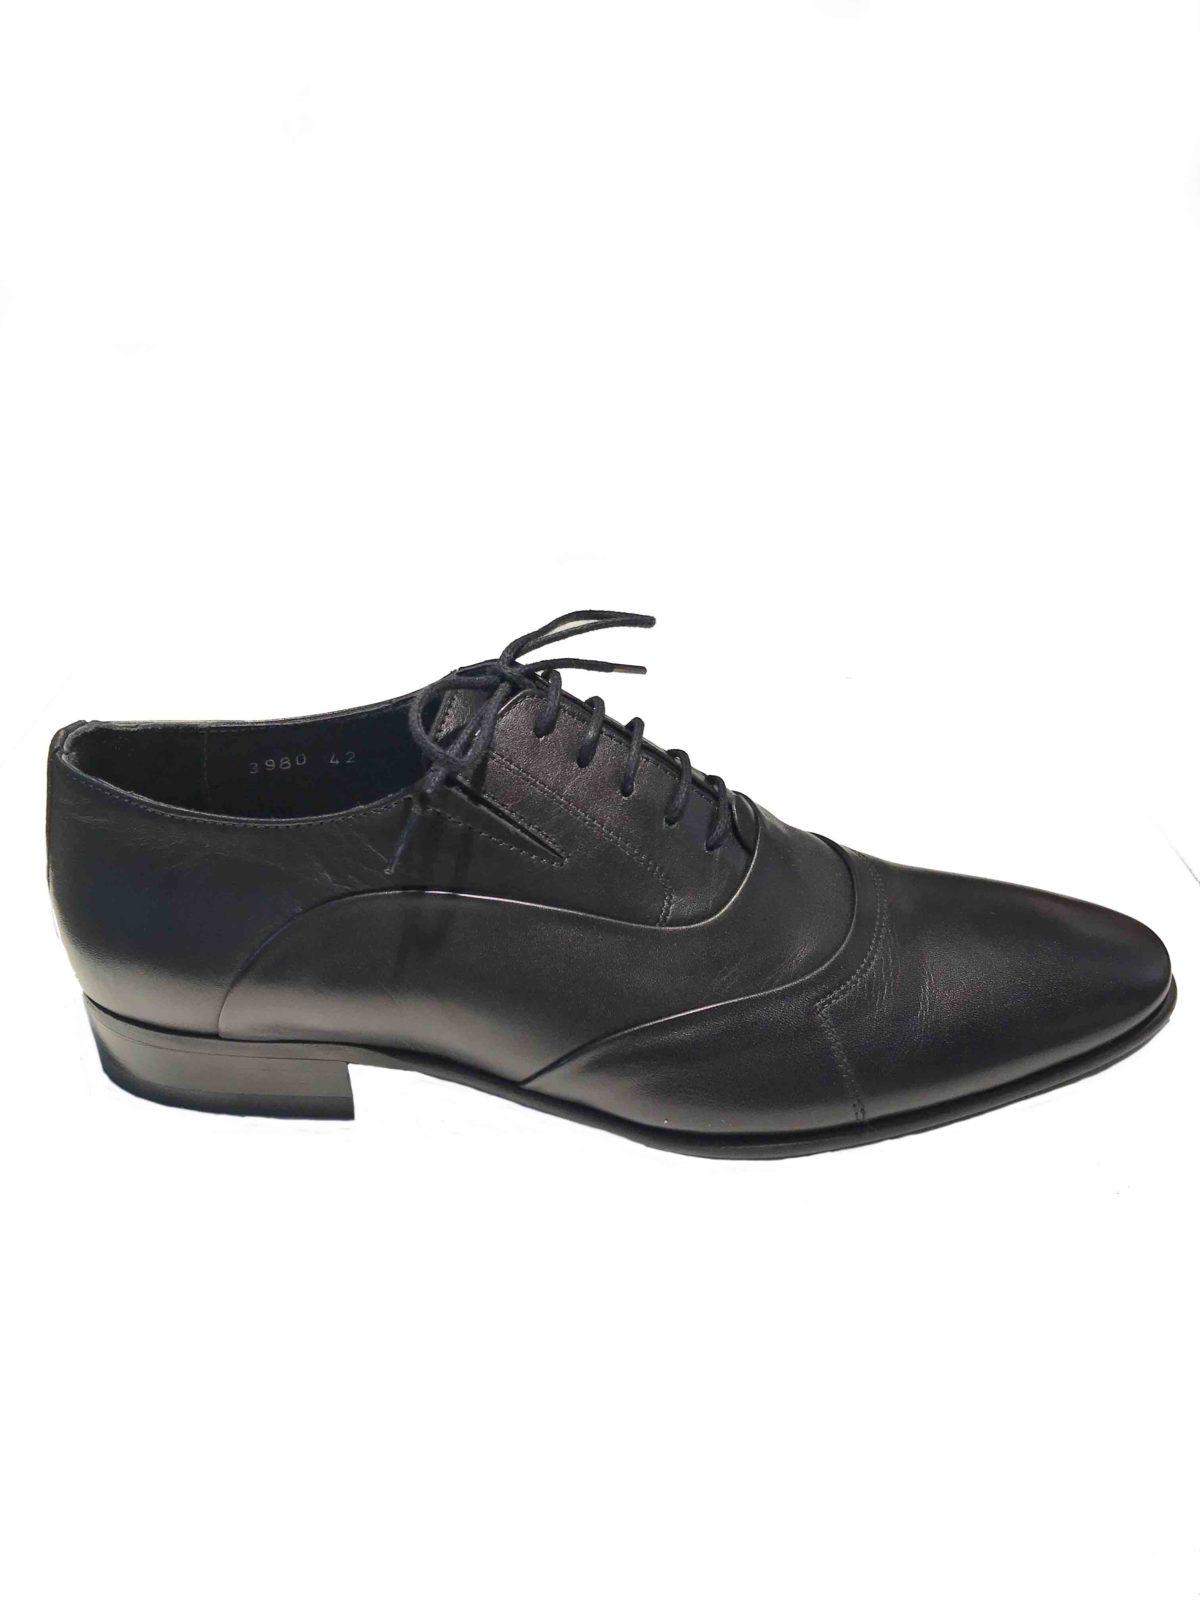 Ben Brown | BB 3980-20 Black shoe